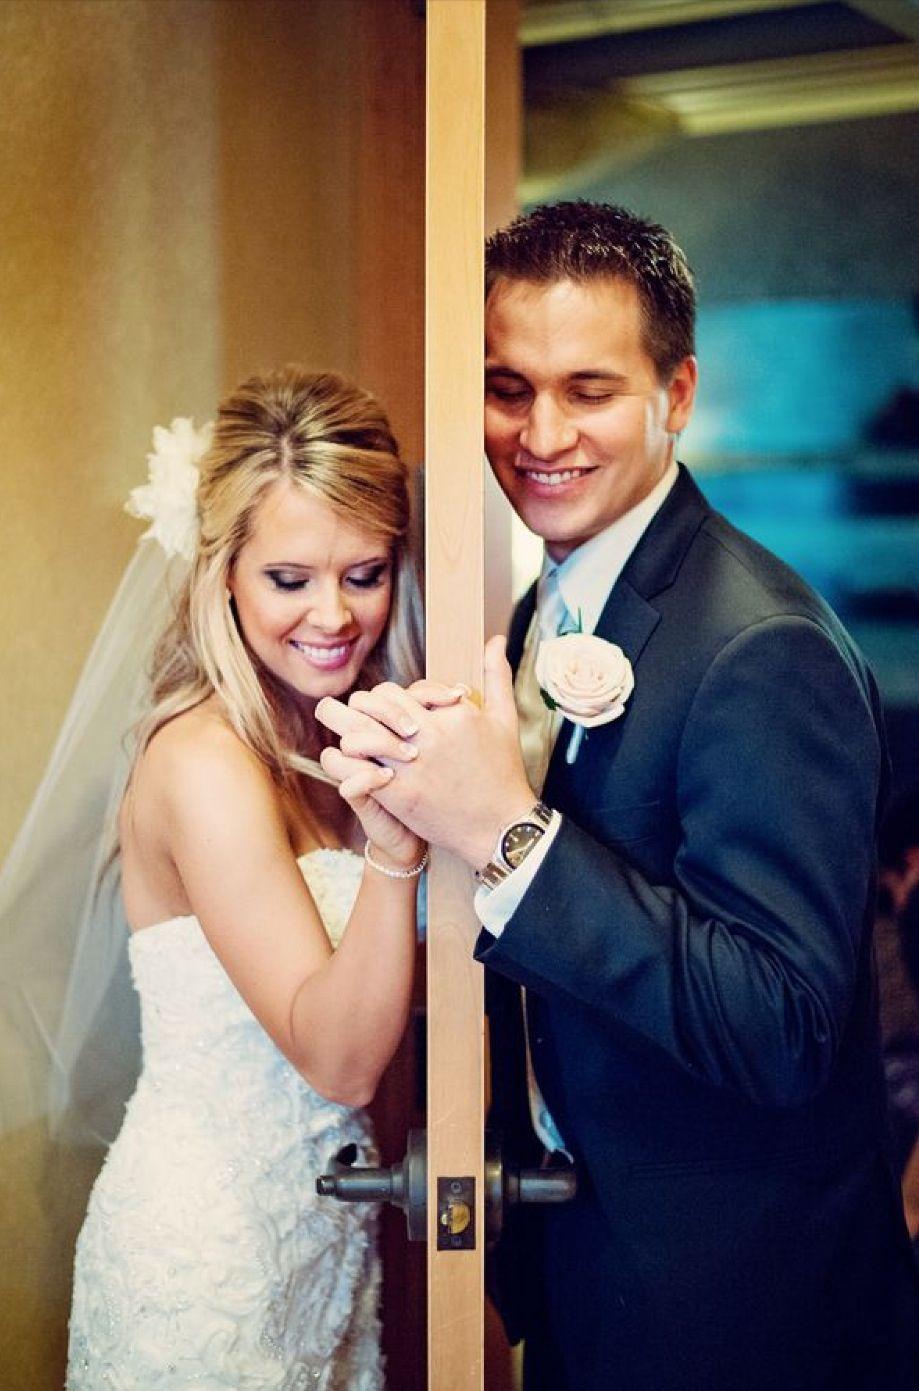 Pin by brandee archambault on weddings pinterest wedding